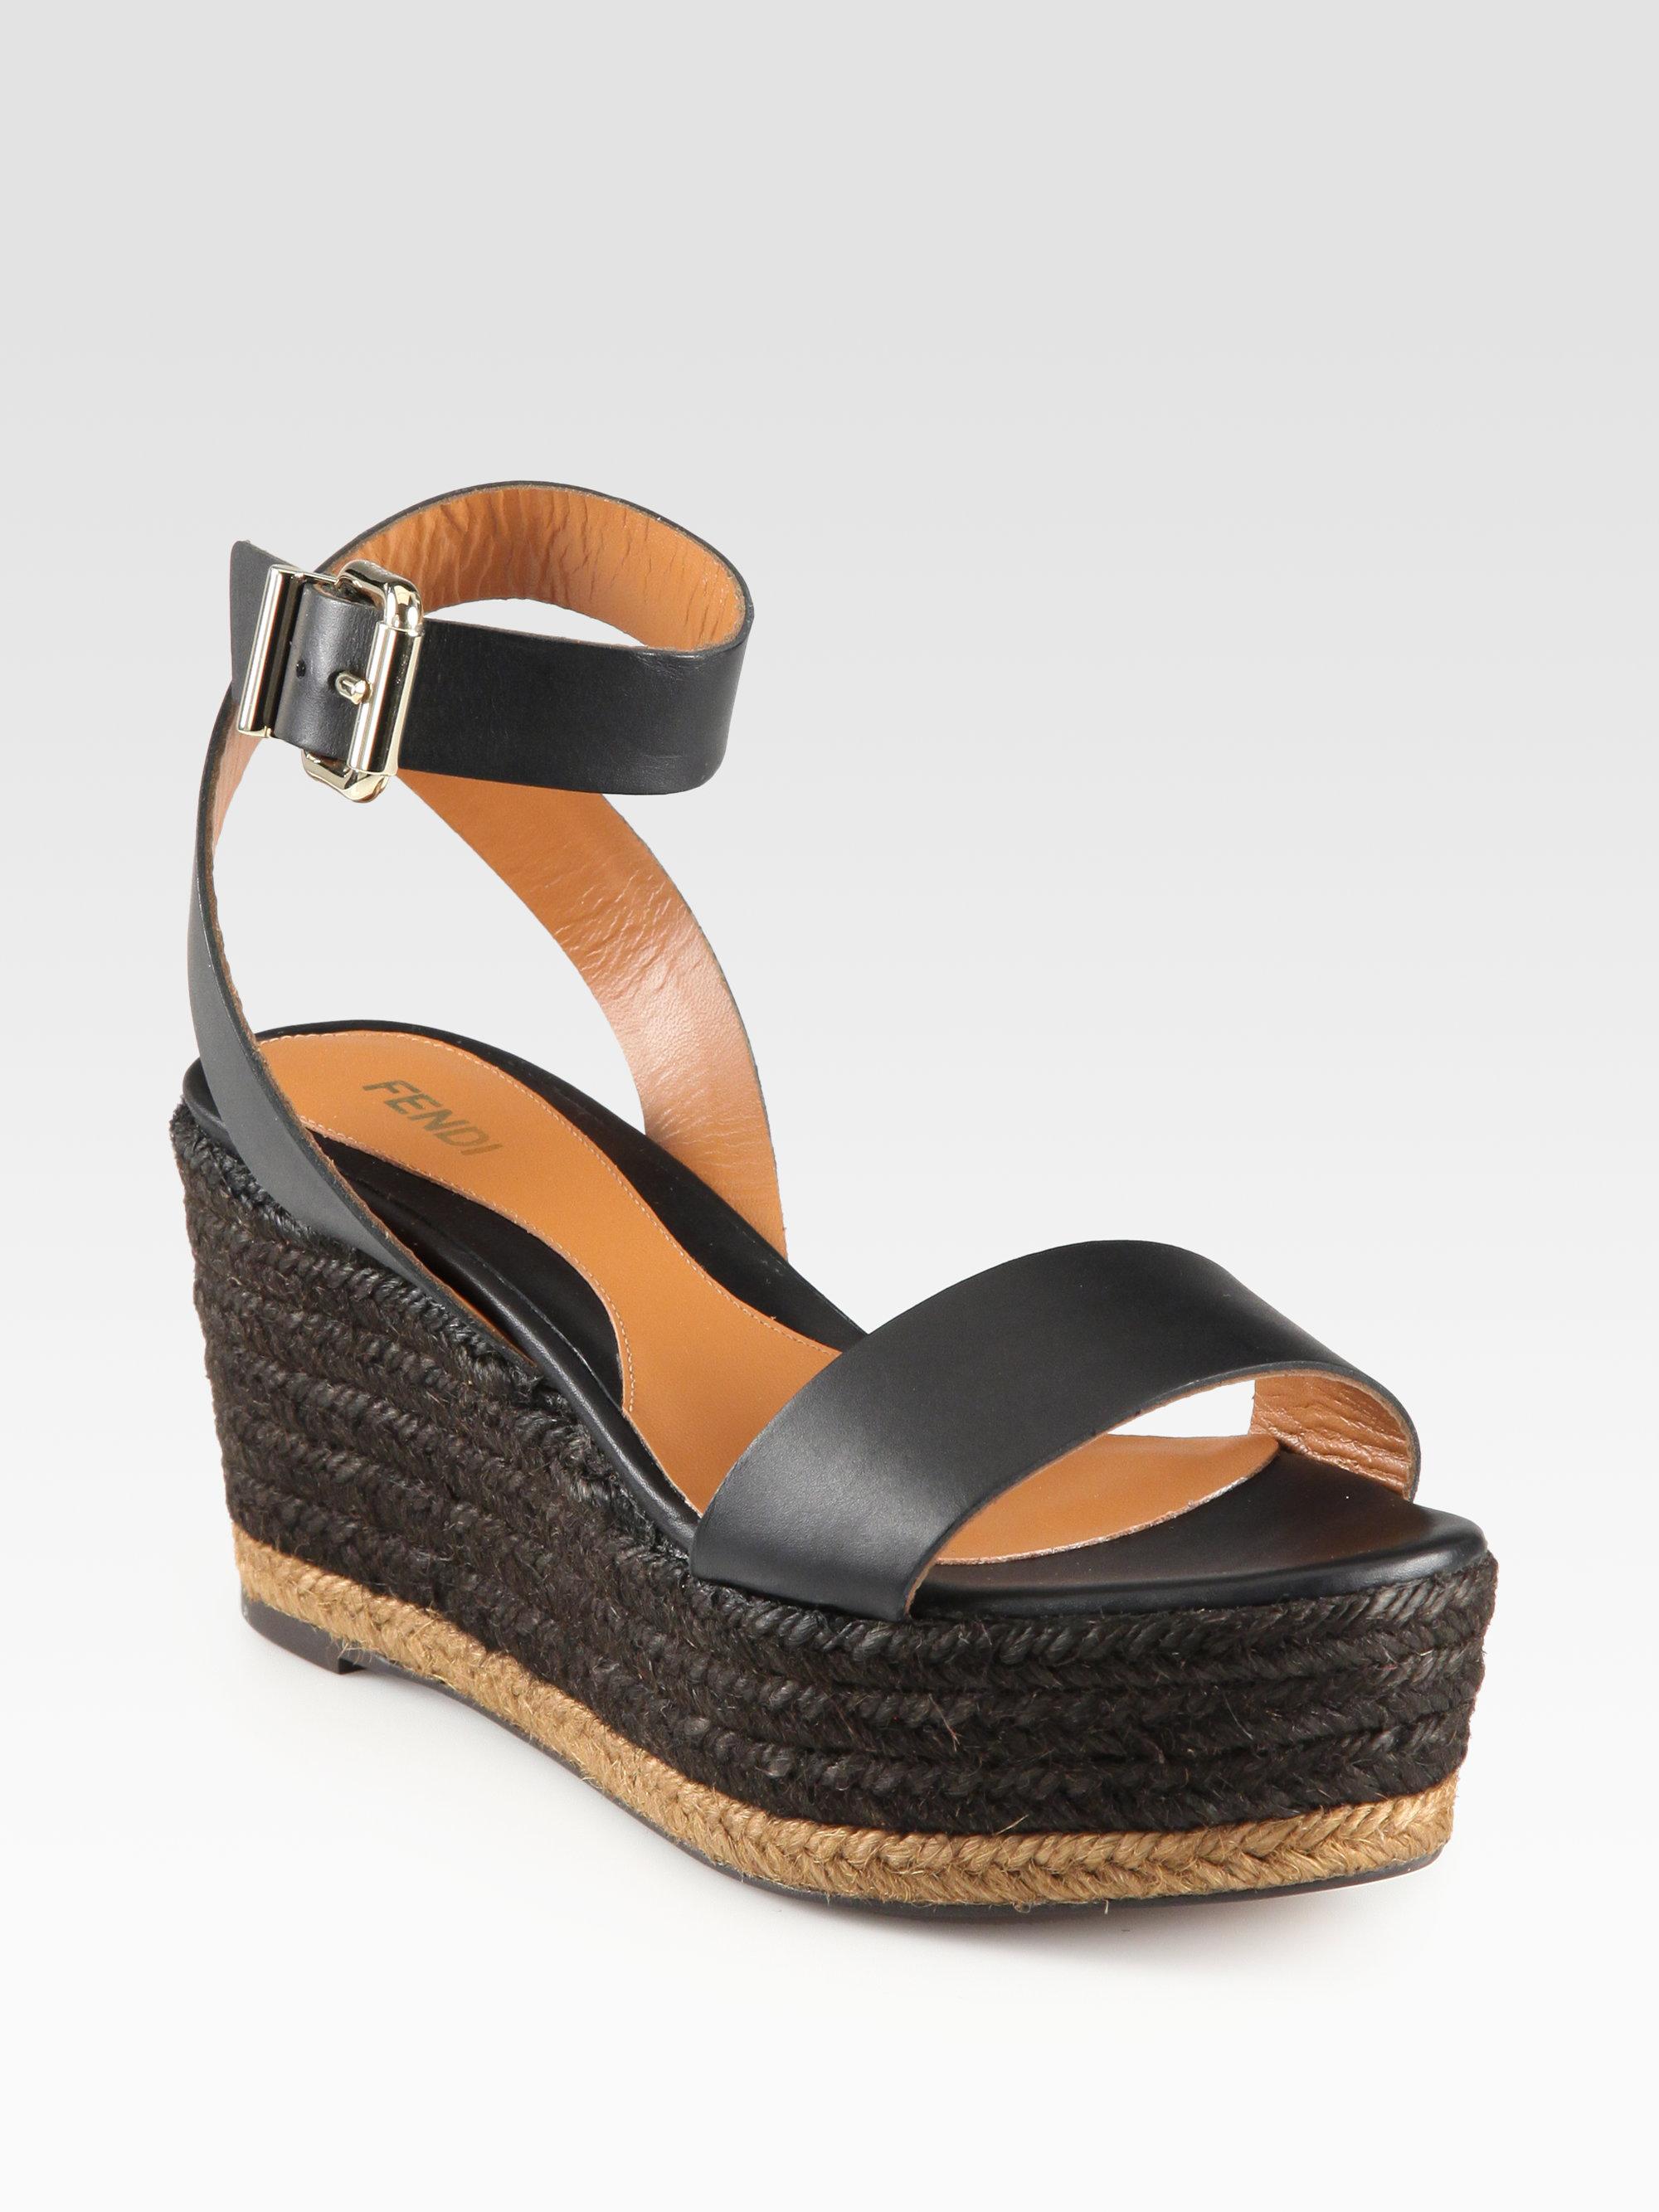 Fendi Leather Espadrille Sandals cheap real authentic discount best place 2015 new sale online 61BU4NSL